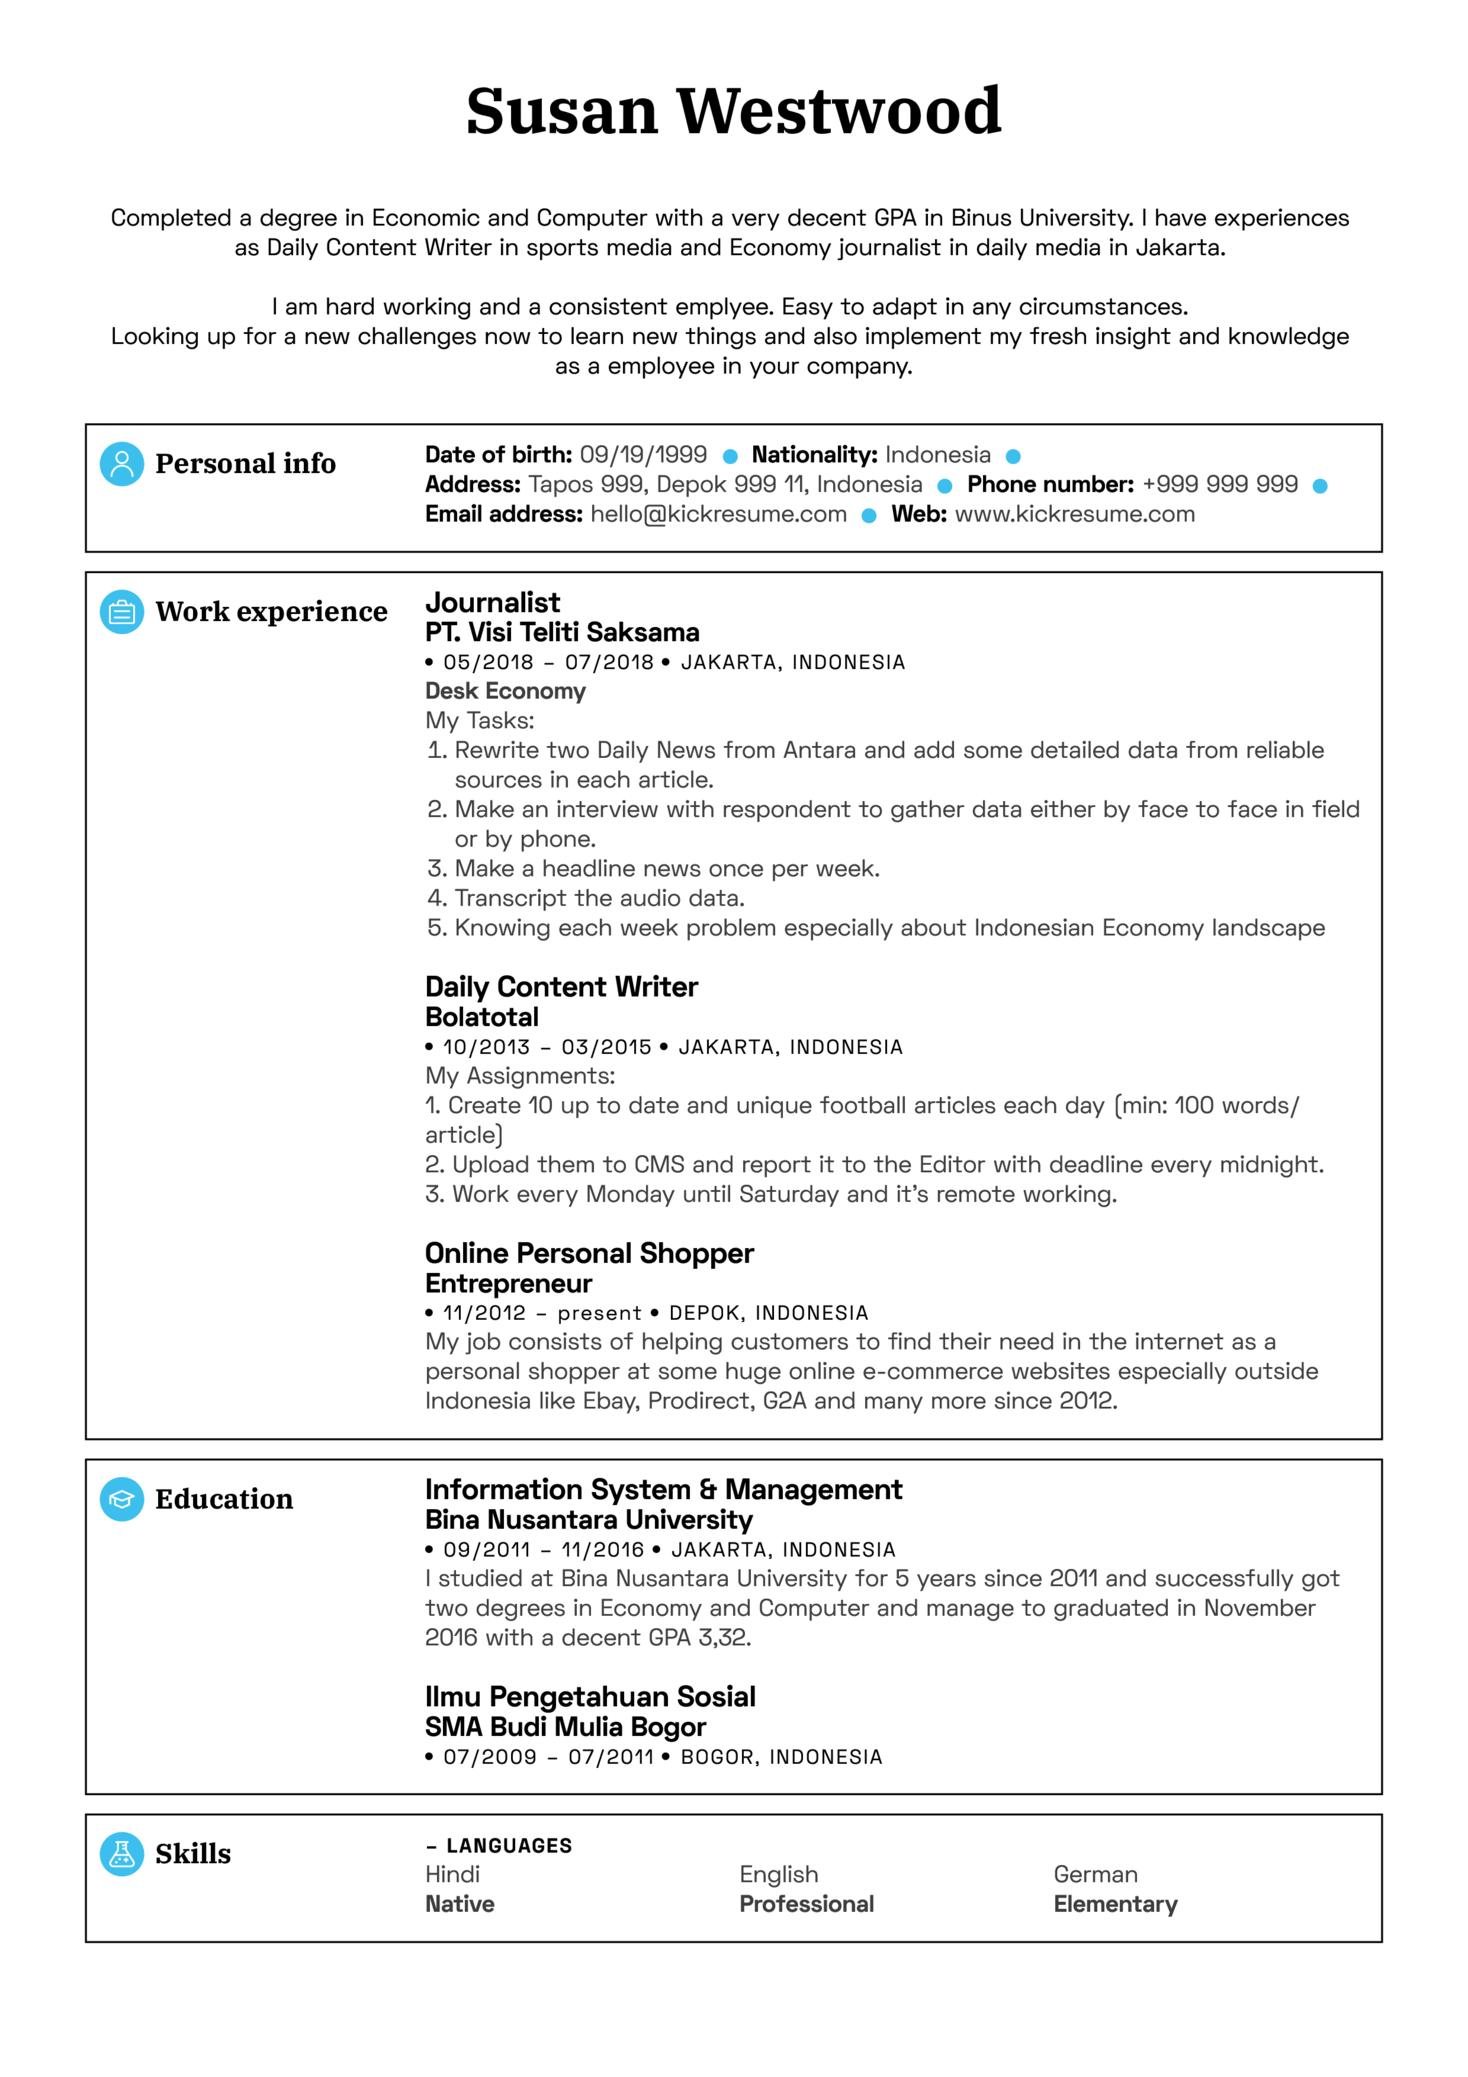 Sales Coordinator Resume Sample (časť 1)